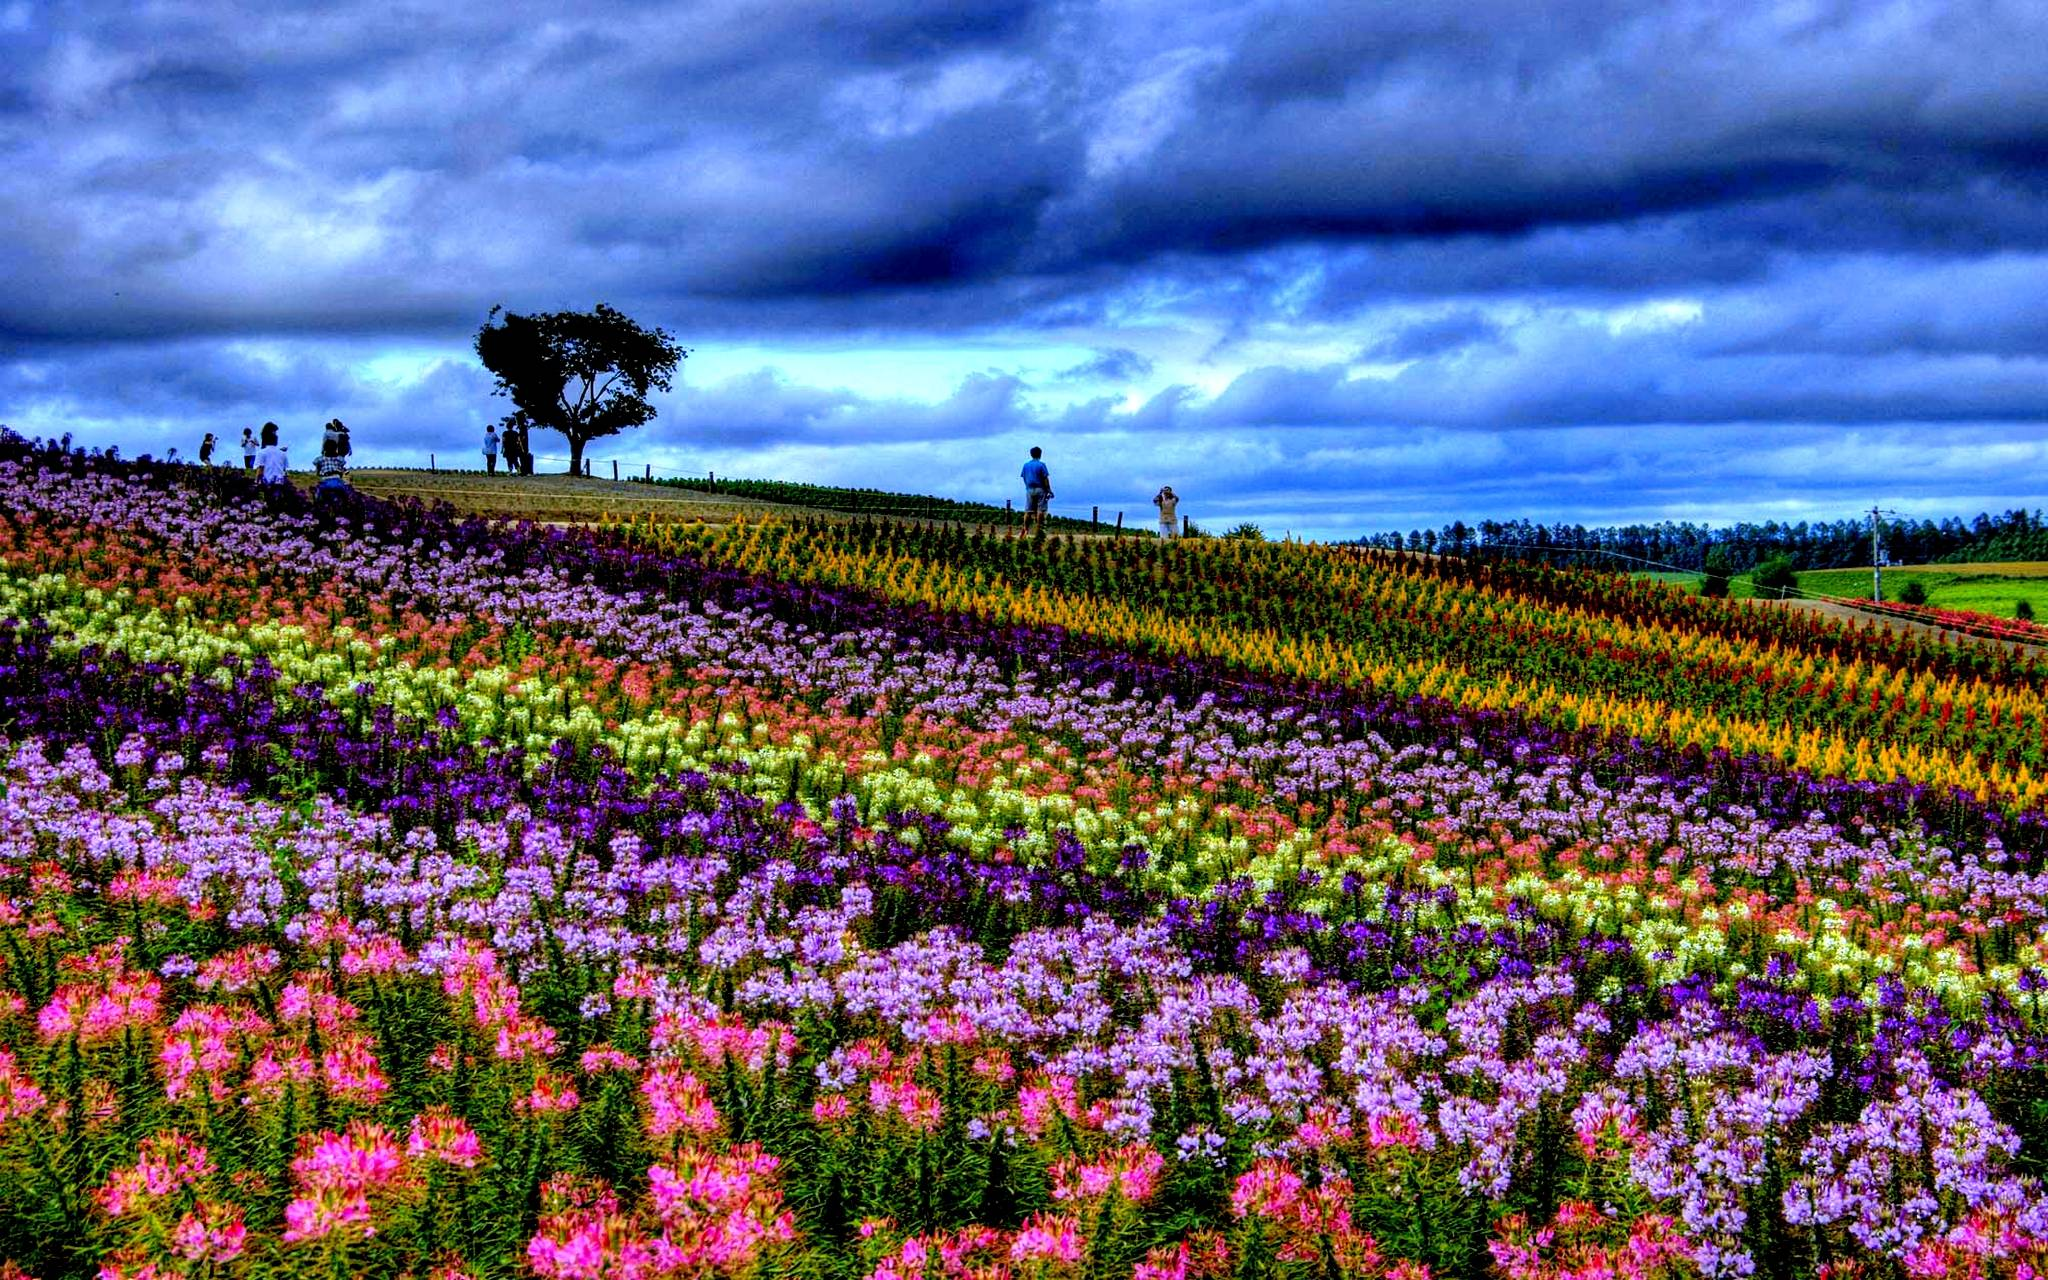 Pin primavera paesaggi hd wallpaper foto sfondi per for Wallpaper hd paesaggi